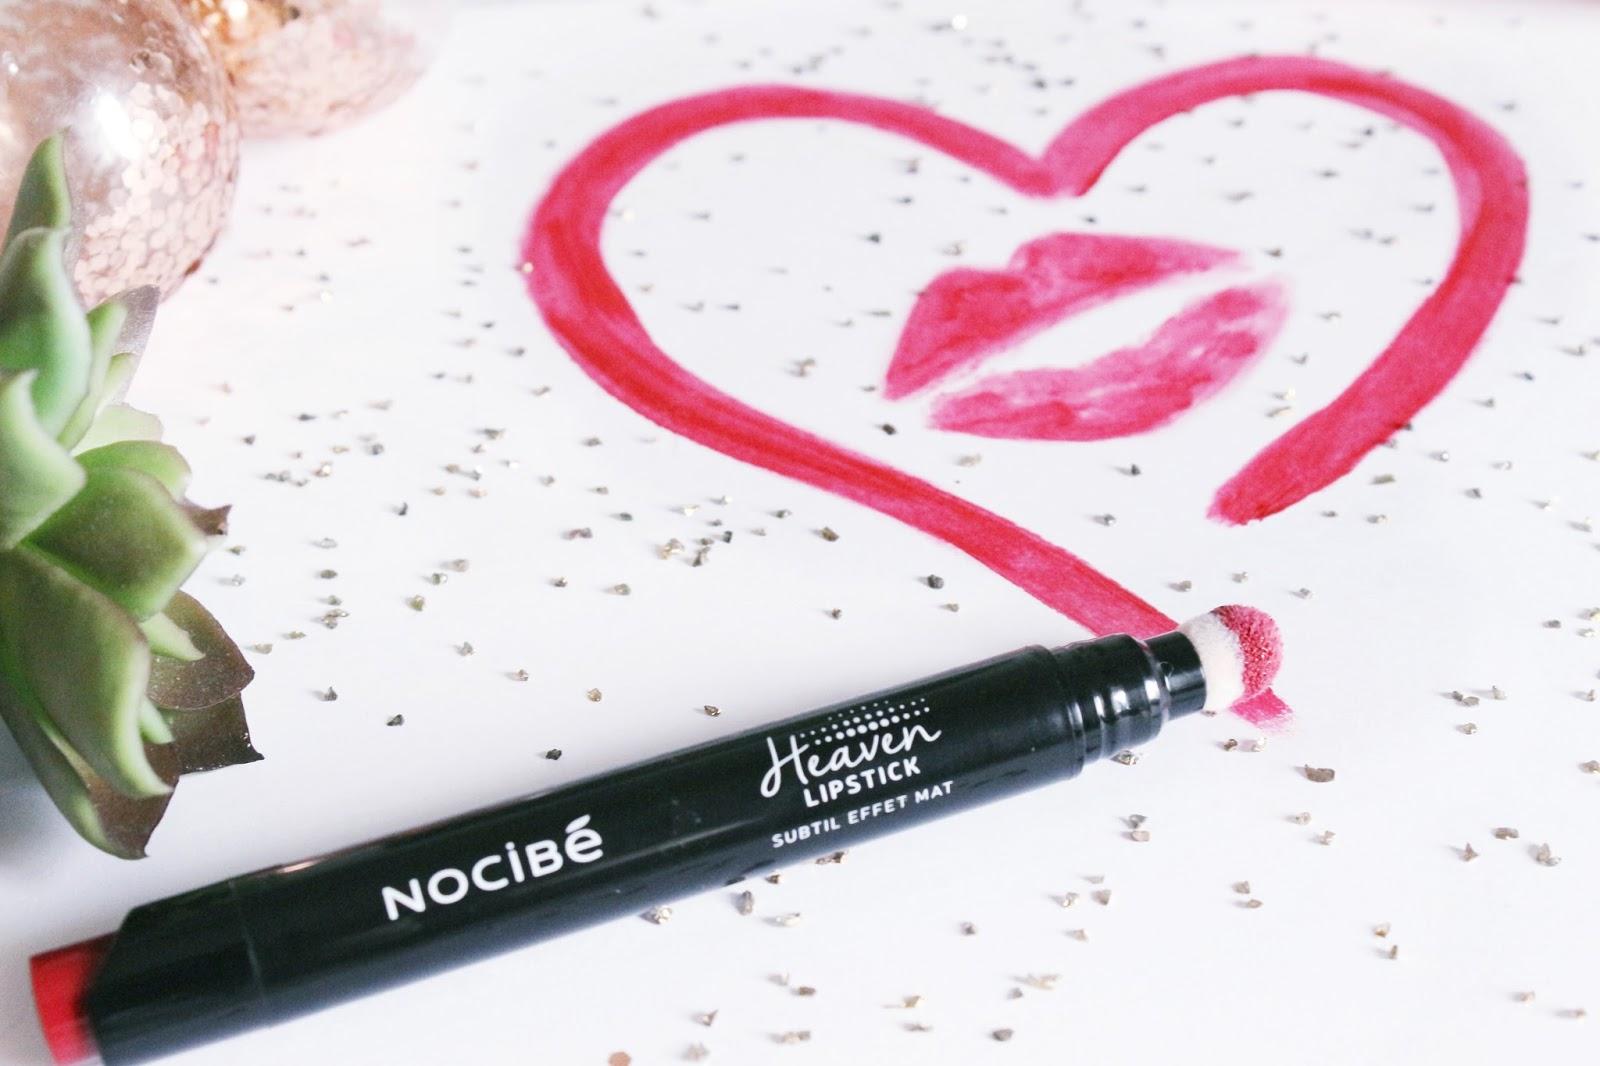 heaven-lipstick-nocibe